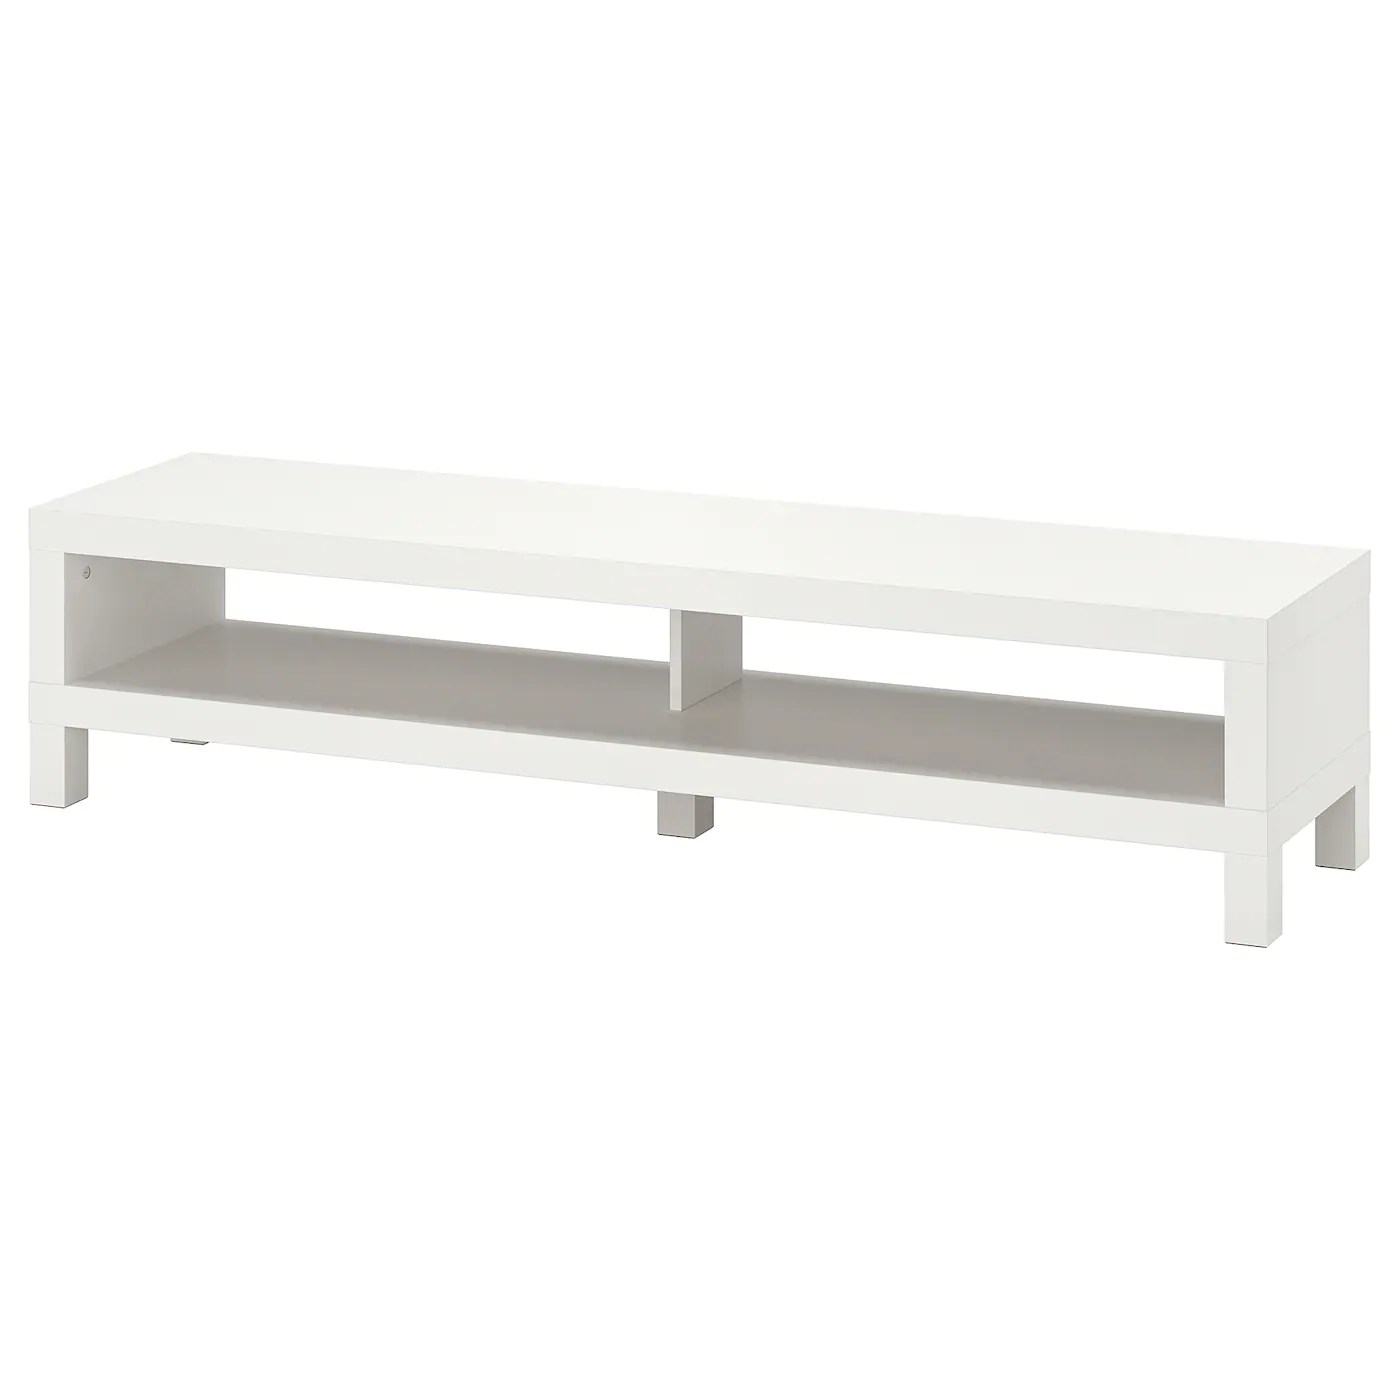 Lack Tv Bench White 160x35x36 Cm Ikea